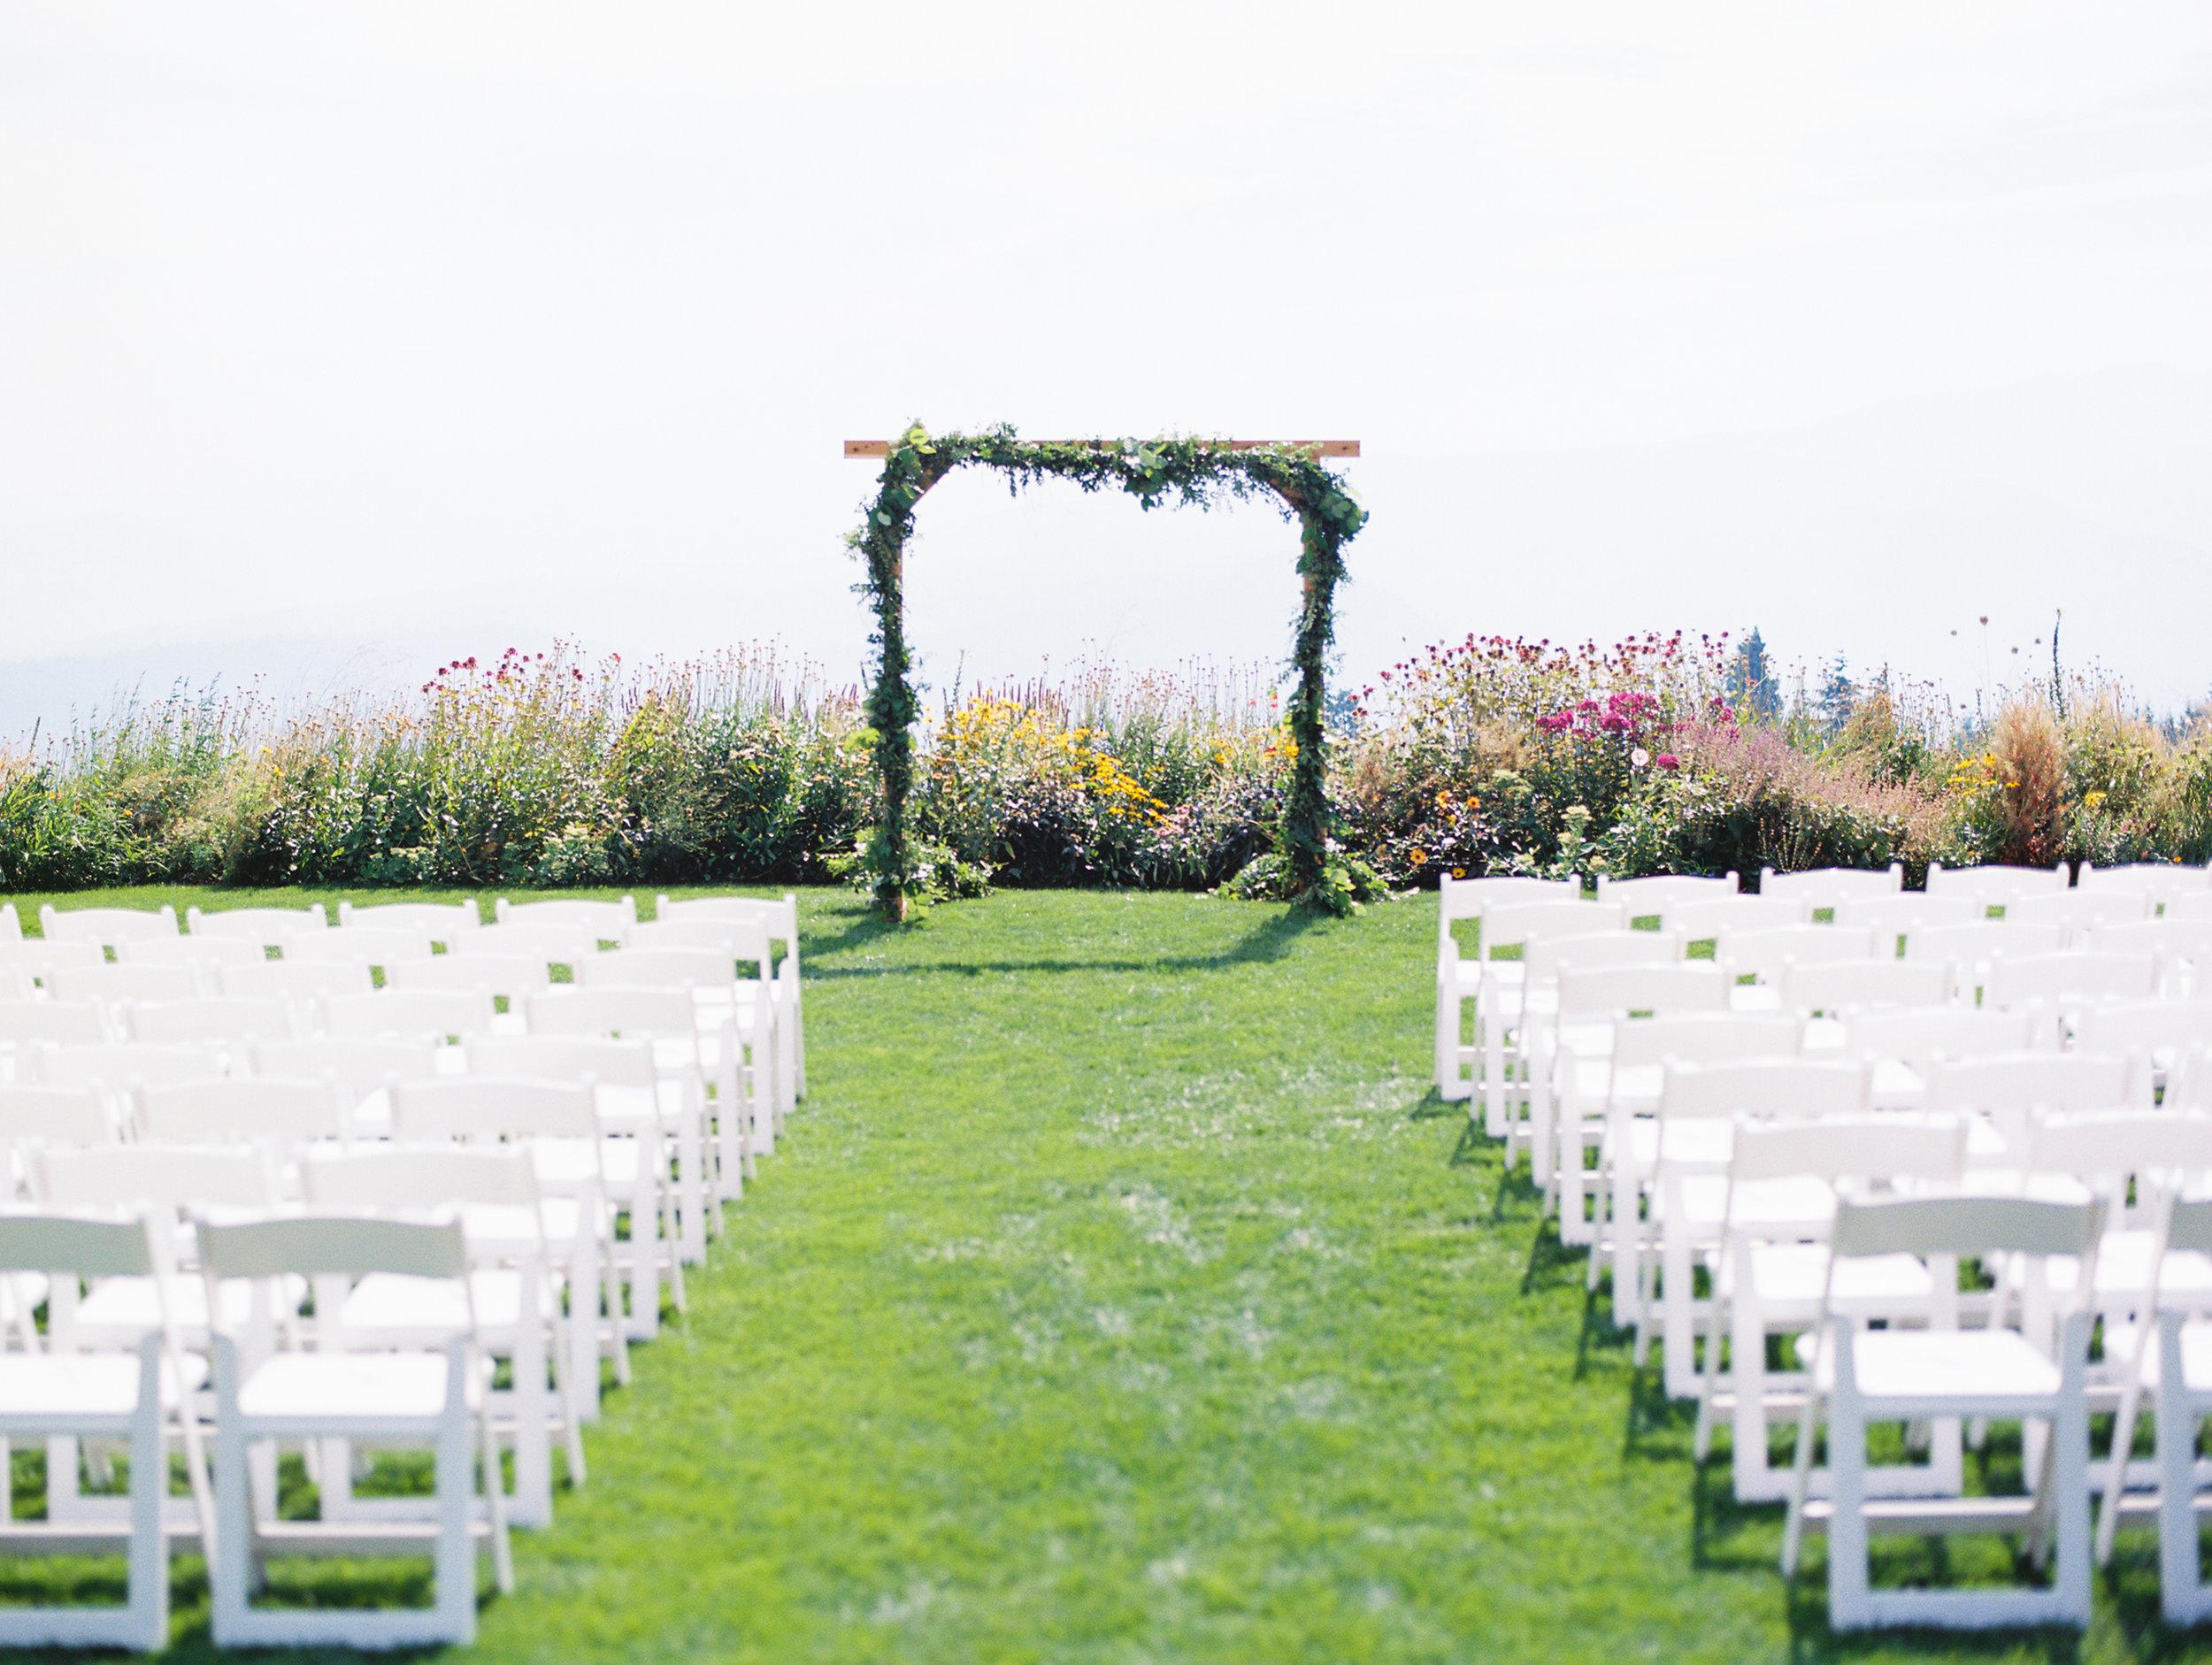 gorge-crest-wedding-venue